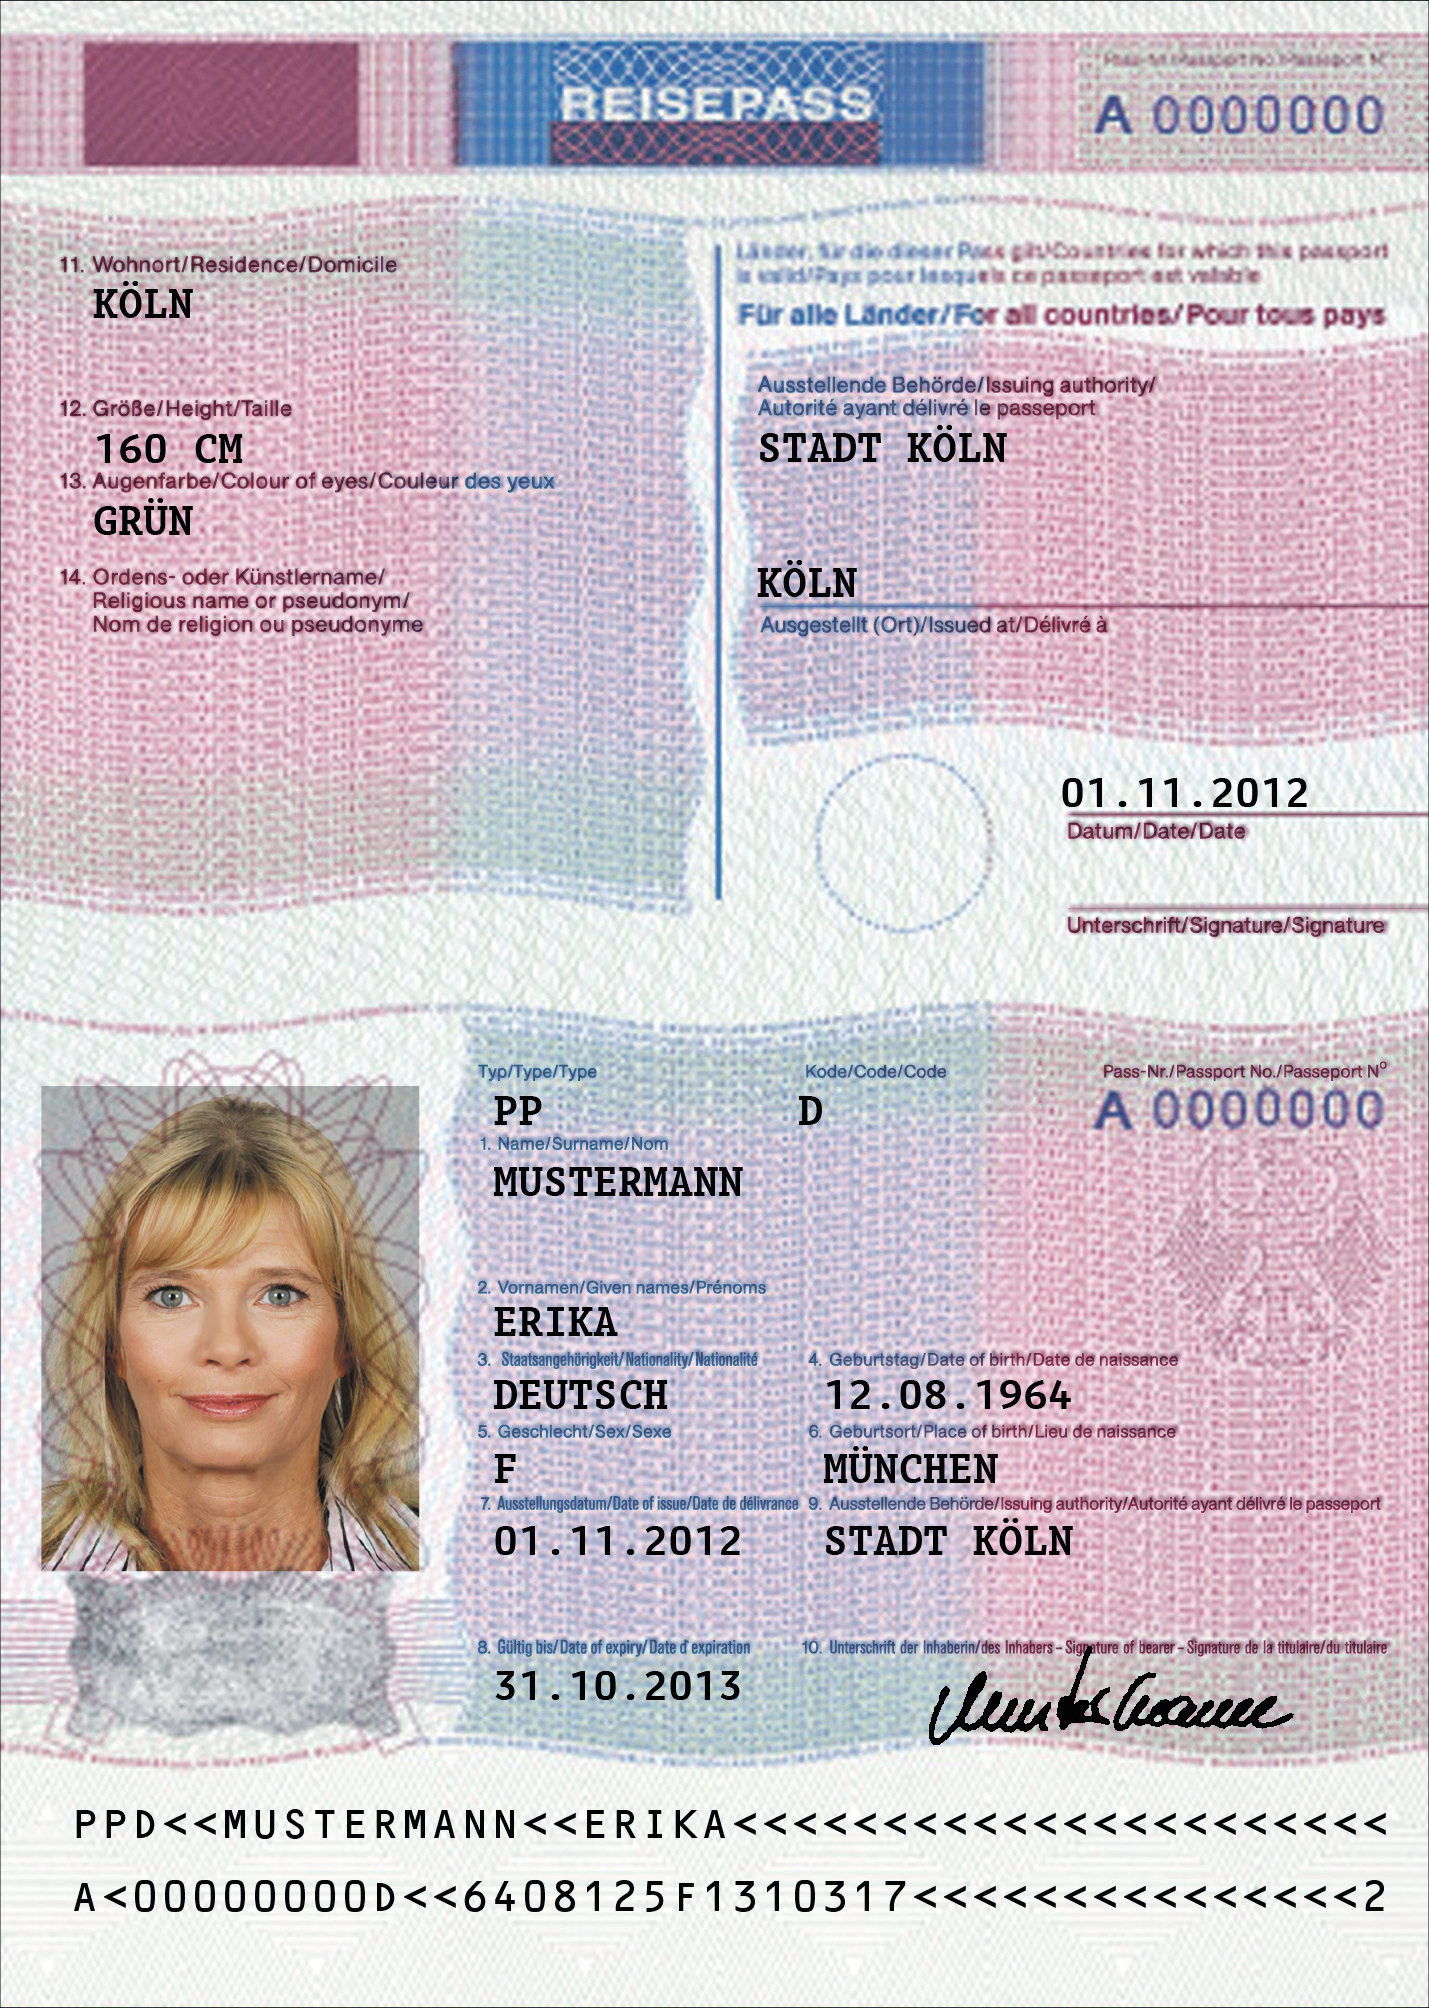 personalausweis uk